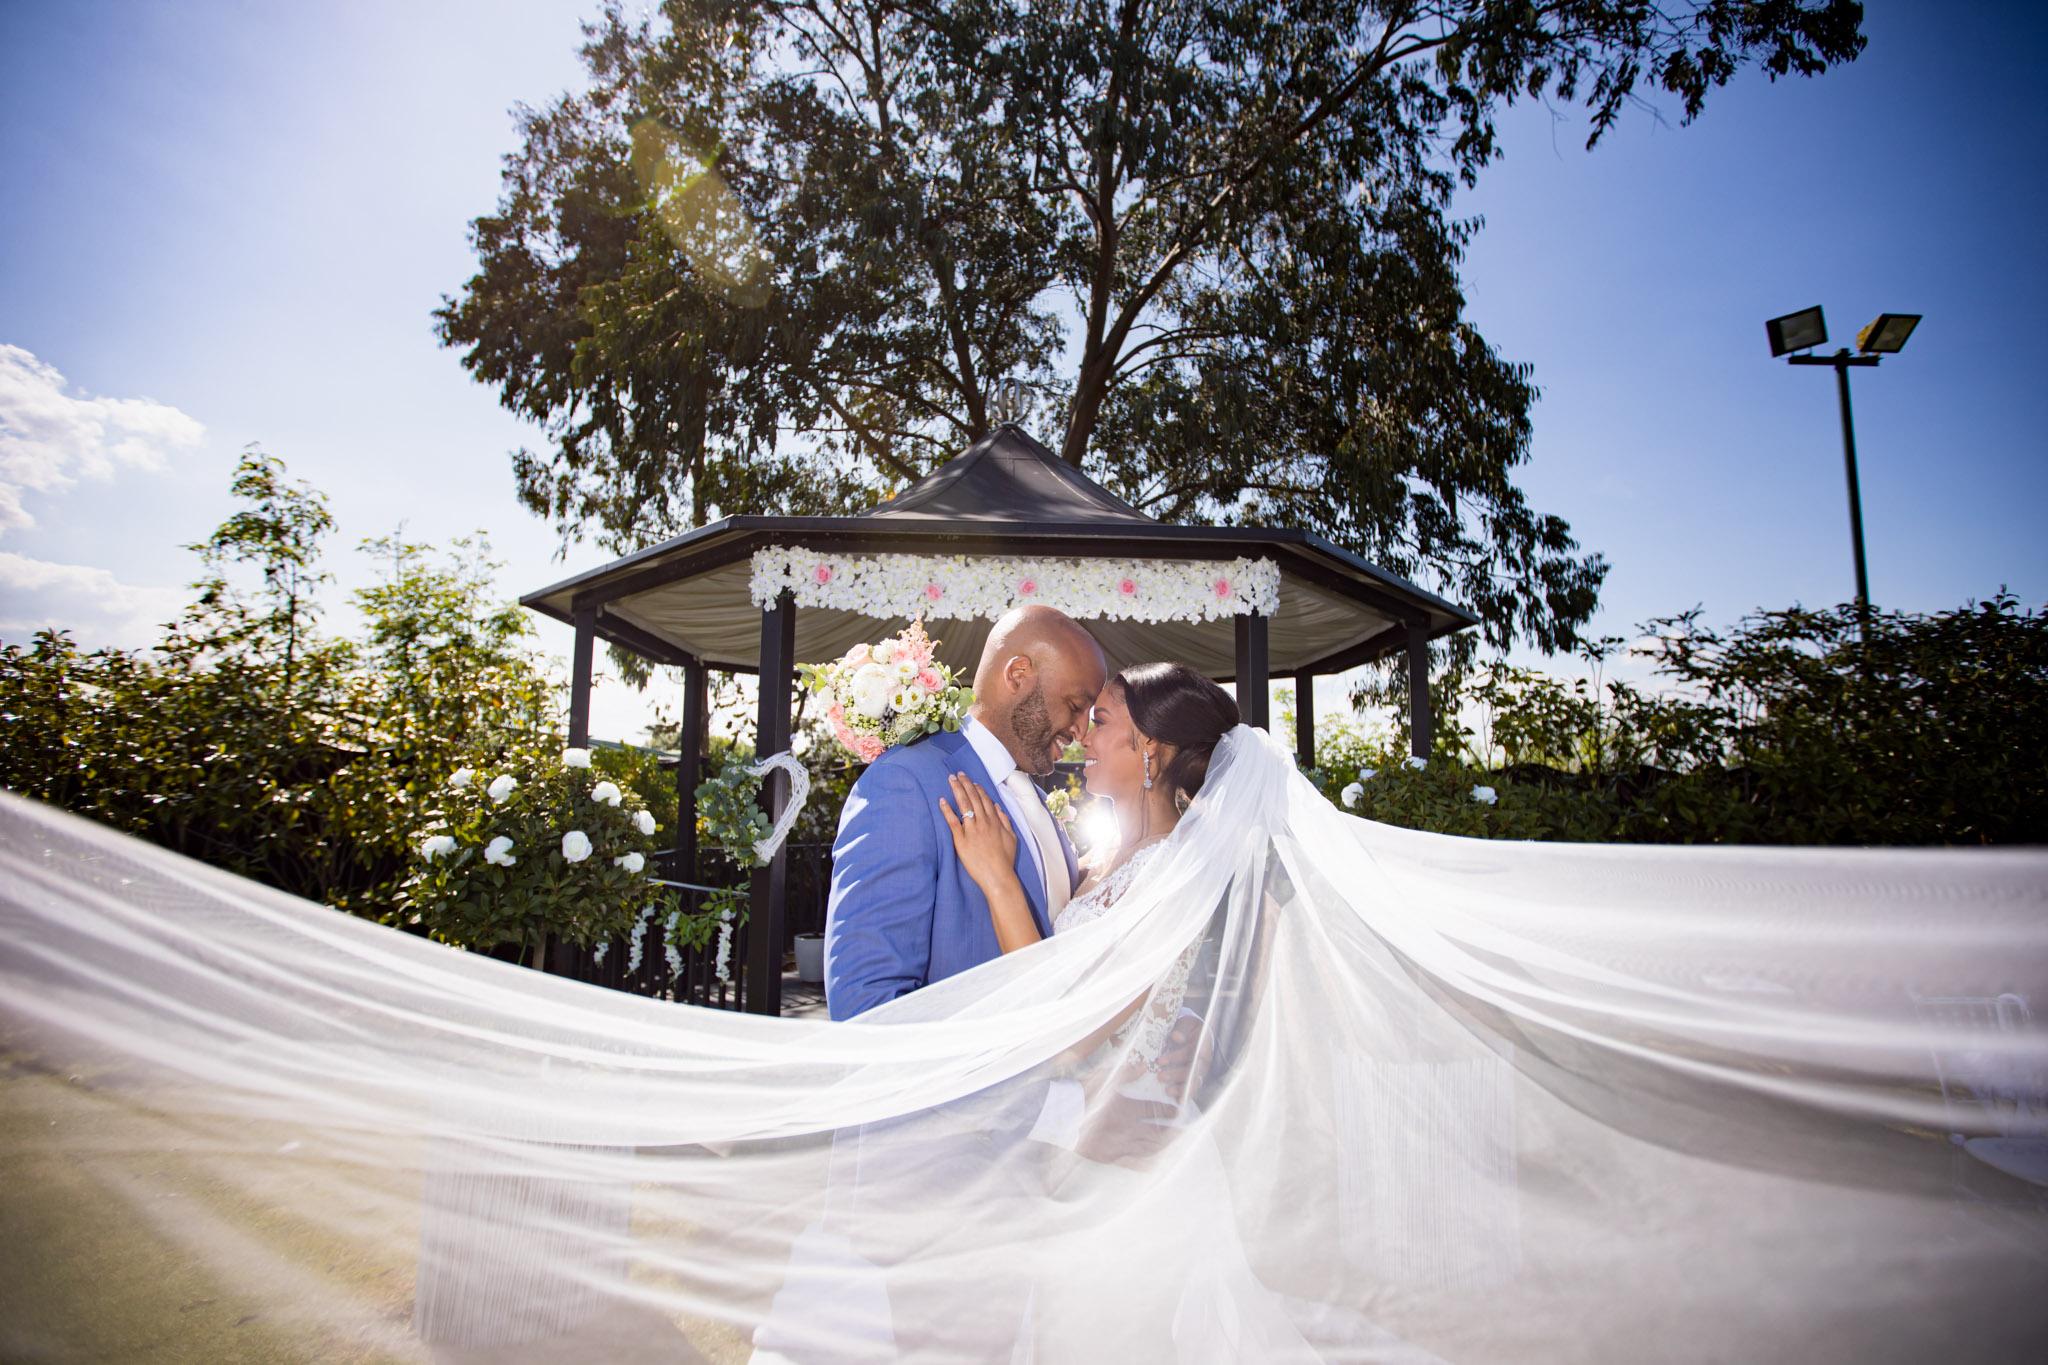 Stock Brook Manor Wedding: Jody & Antoine